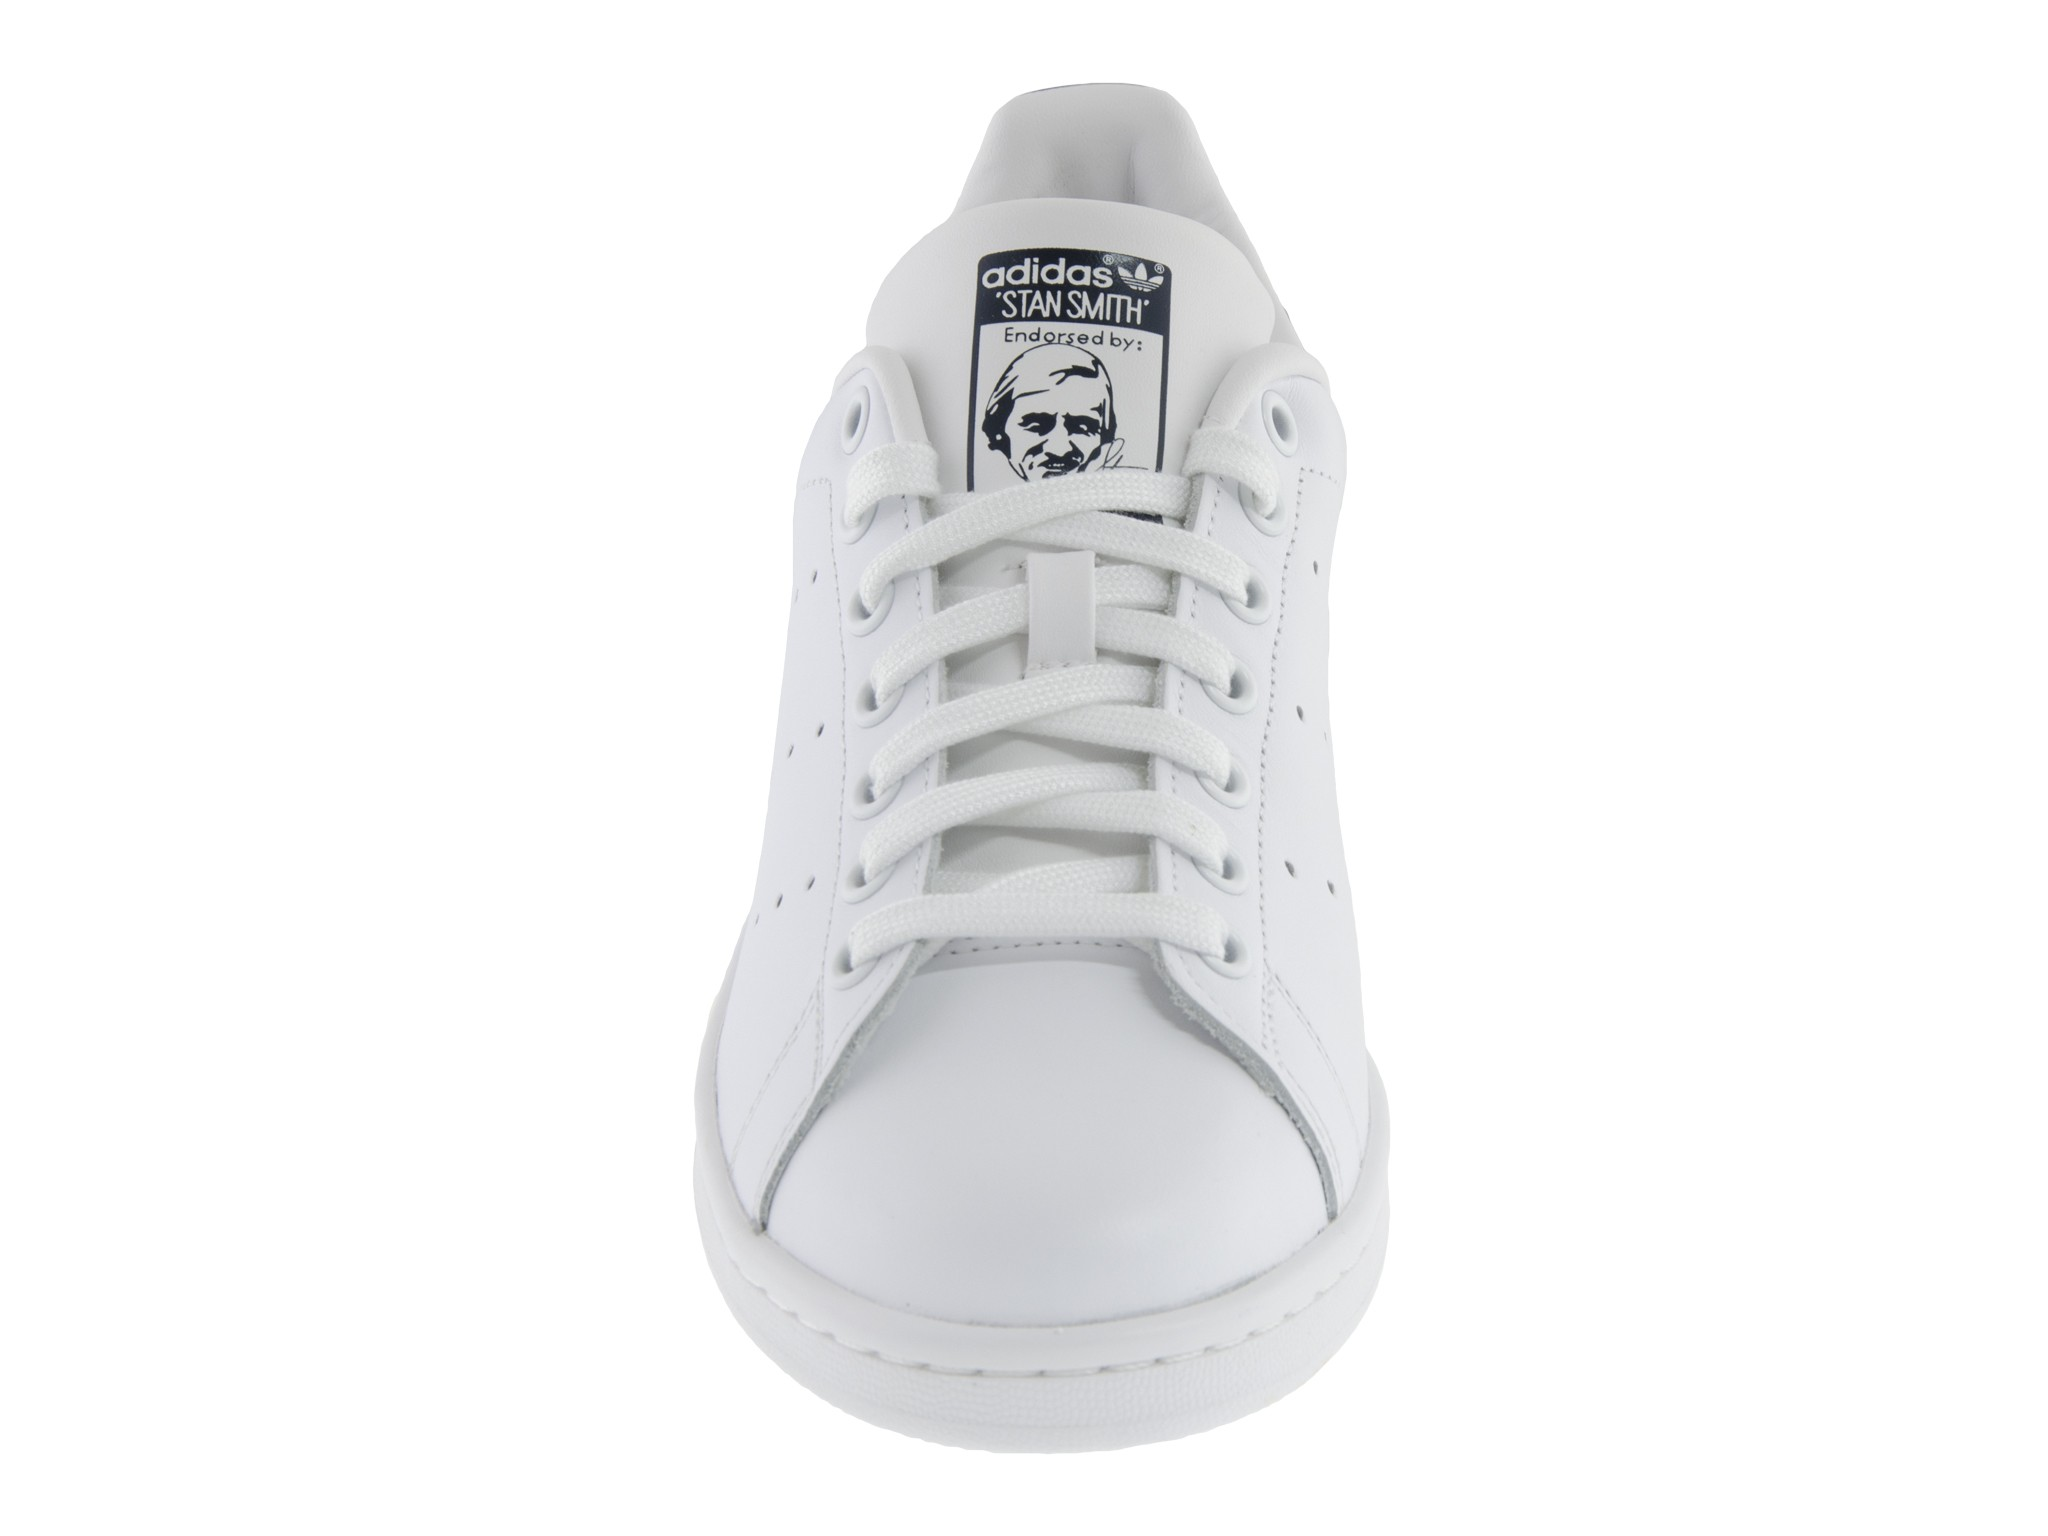 promo code 07916 4f16c scarpe-adidas-stan-smith-uomo-bianco-e-blu.jpg